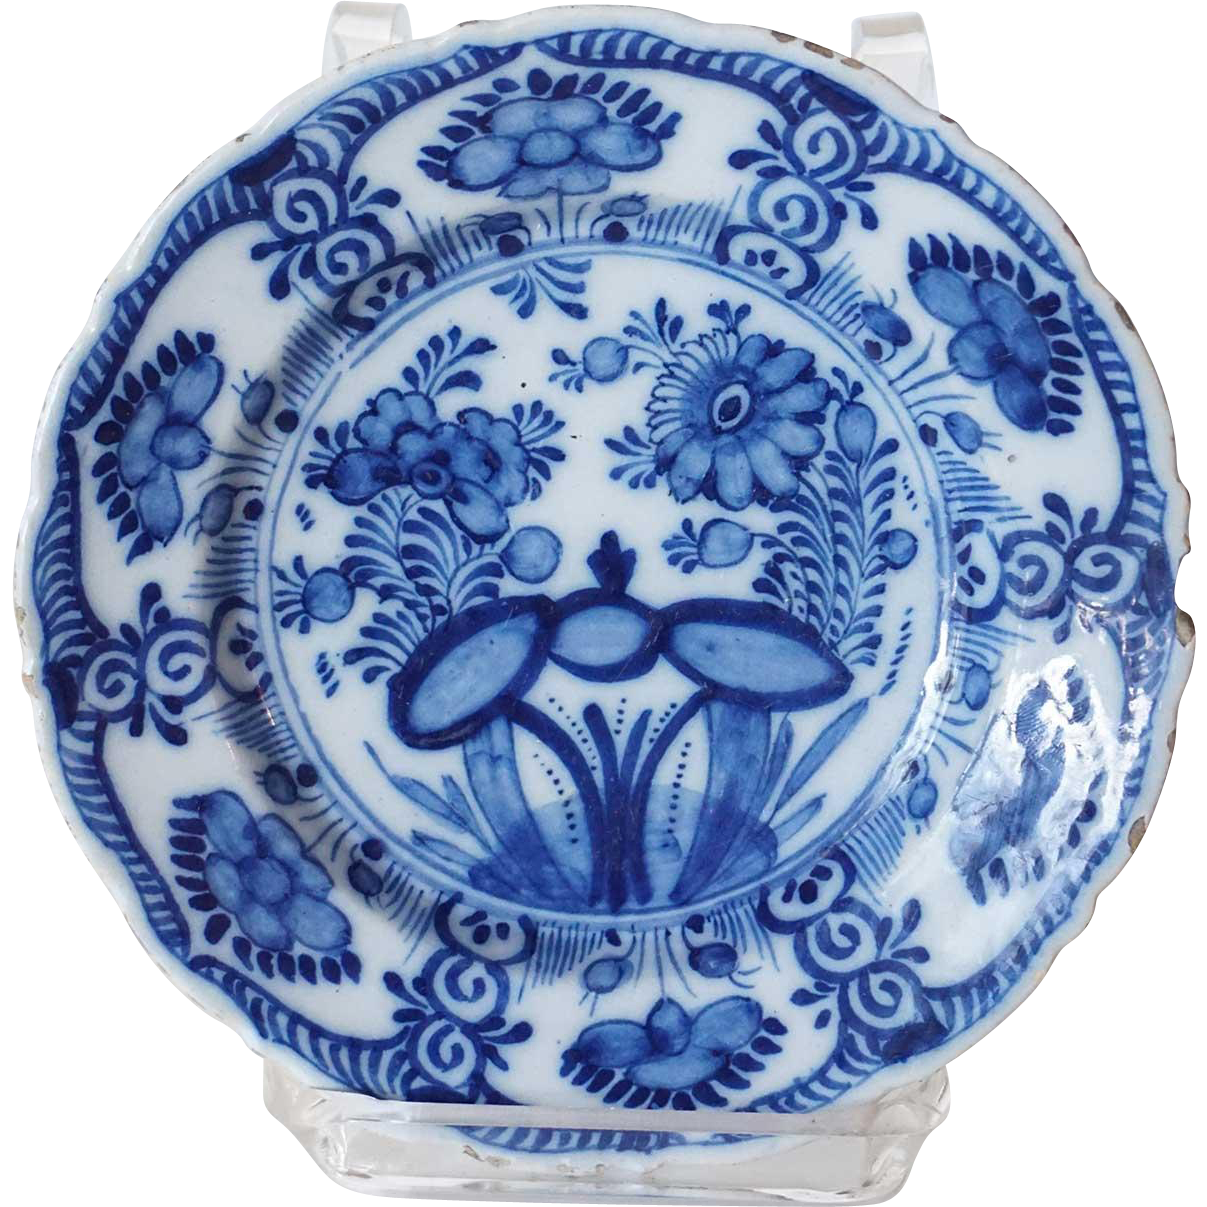 Small Dutch Delft De Klauw Blue and White Pottery Floral Plate